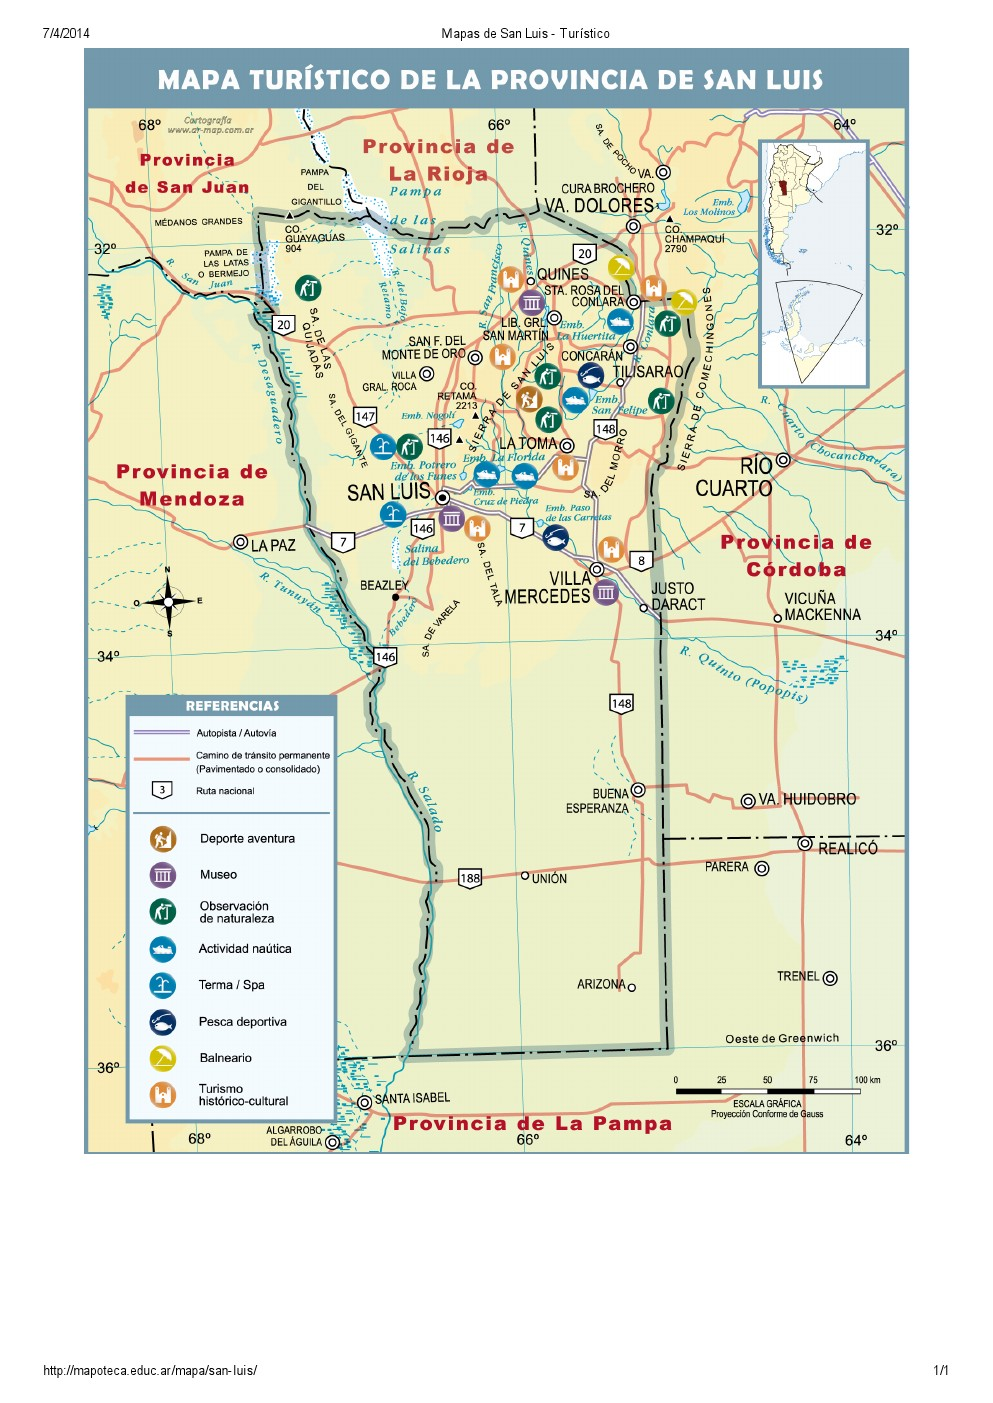 Mapa turístico de San Luis. Mapoteca de Educ.ar